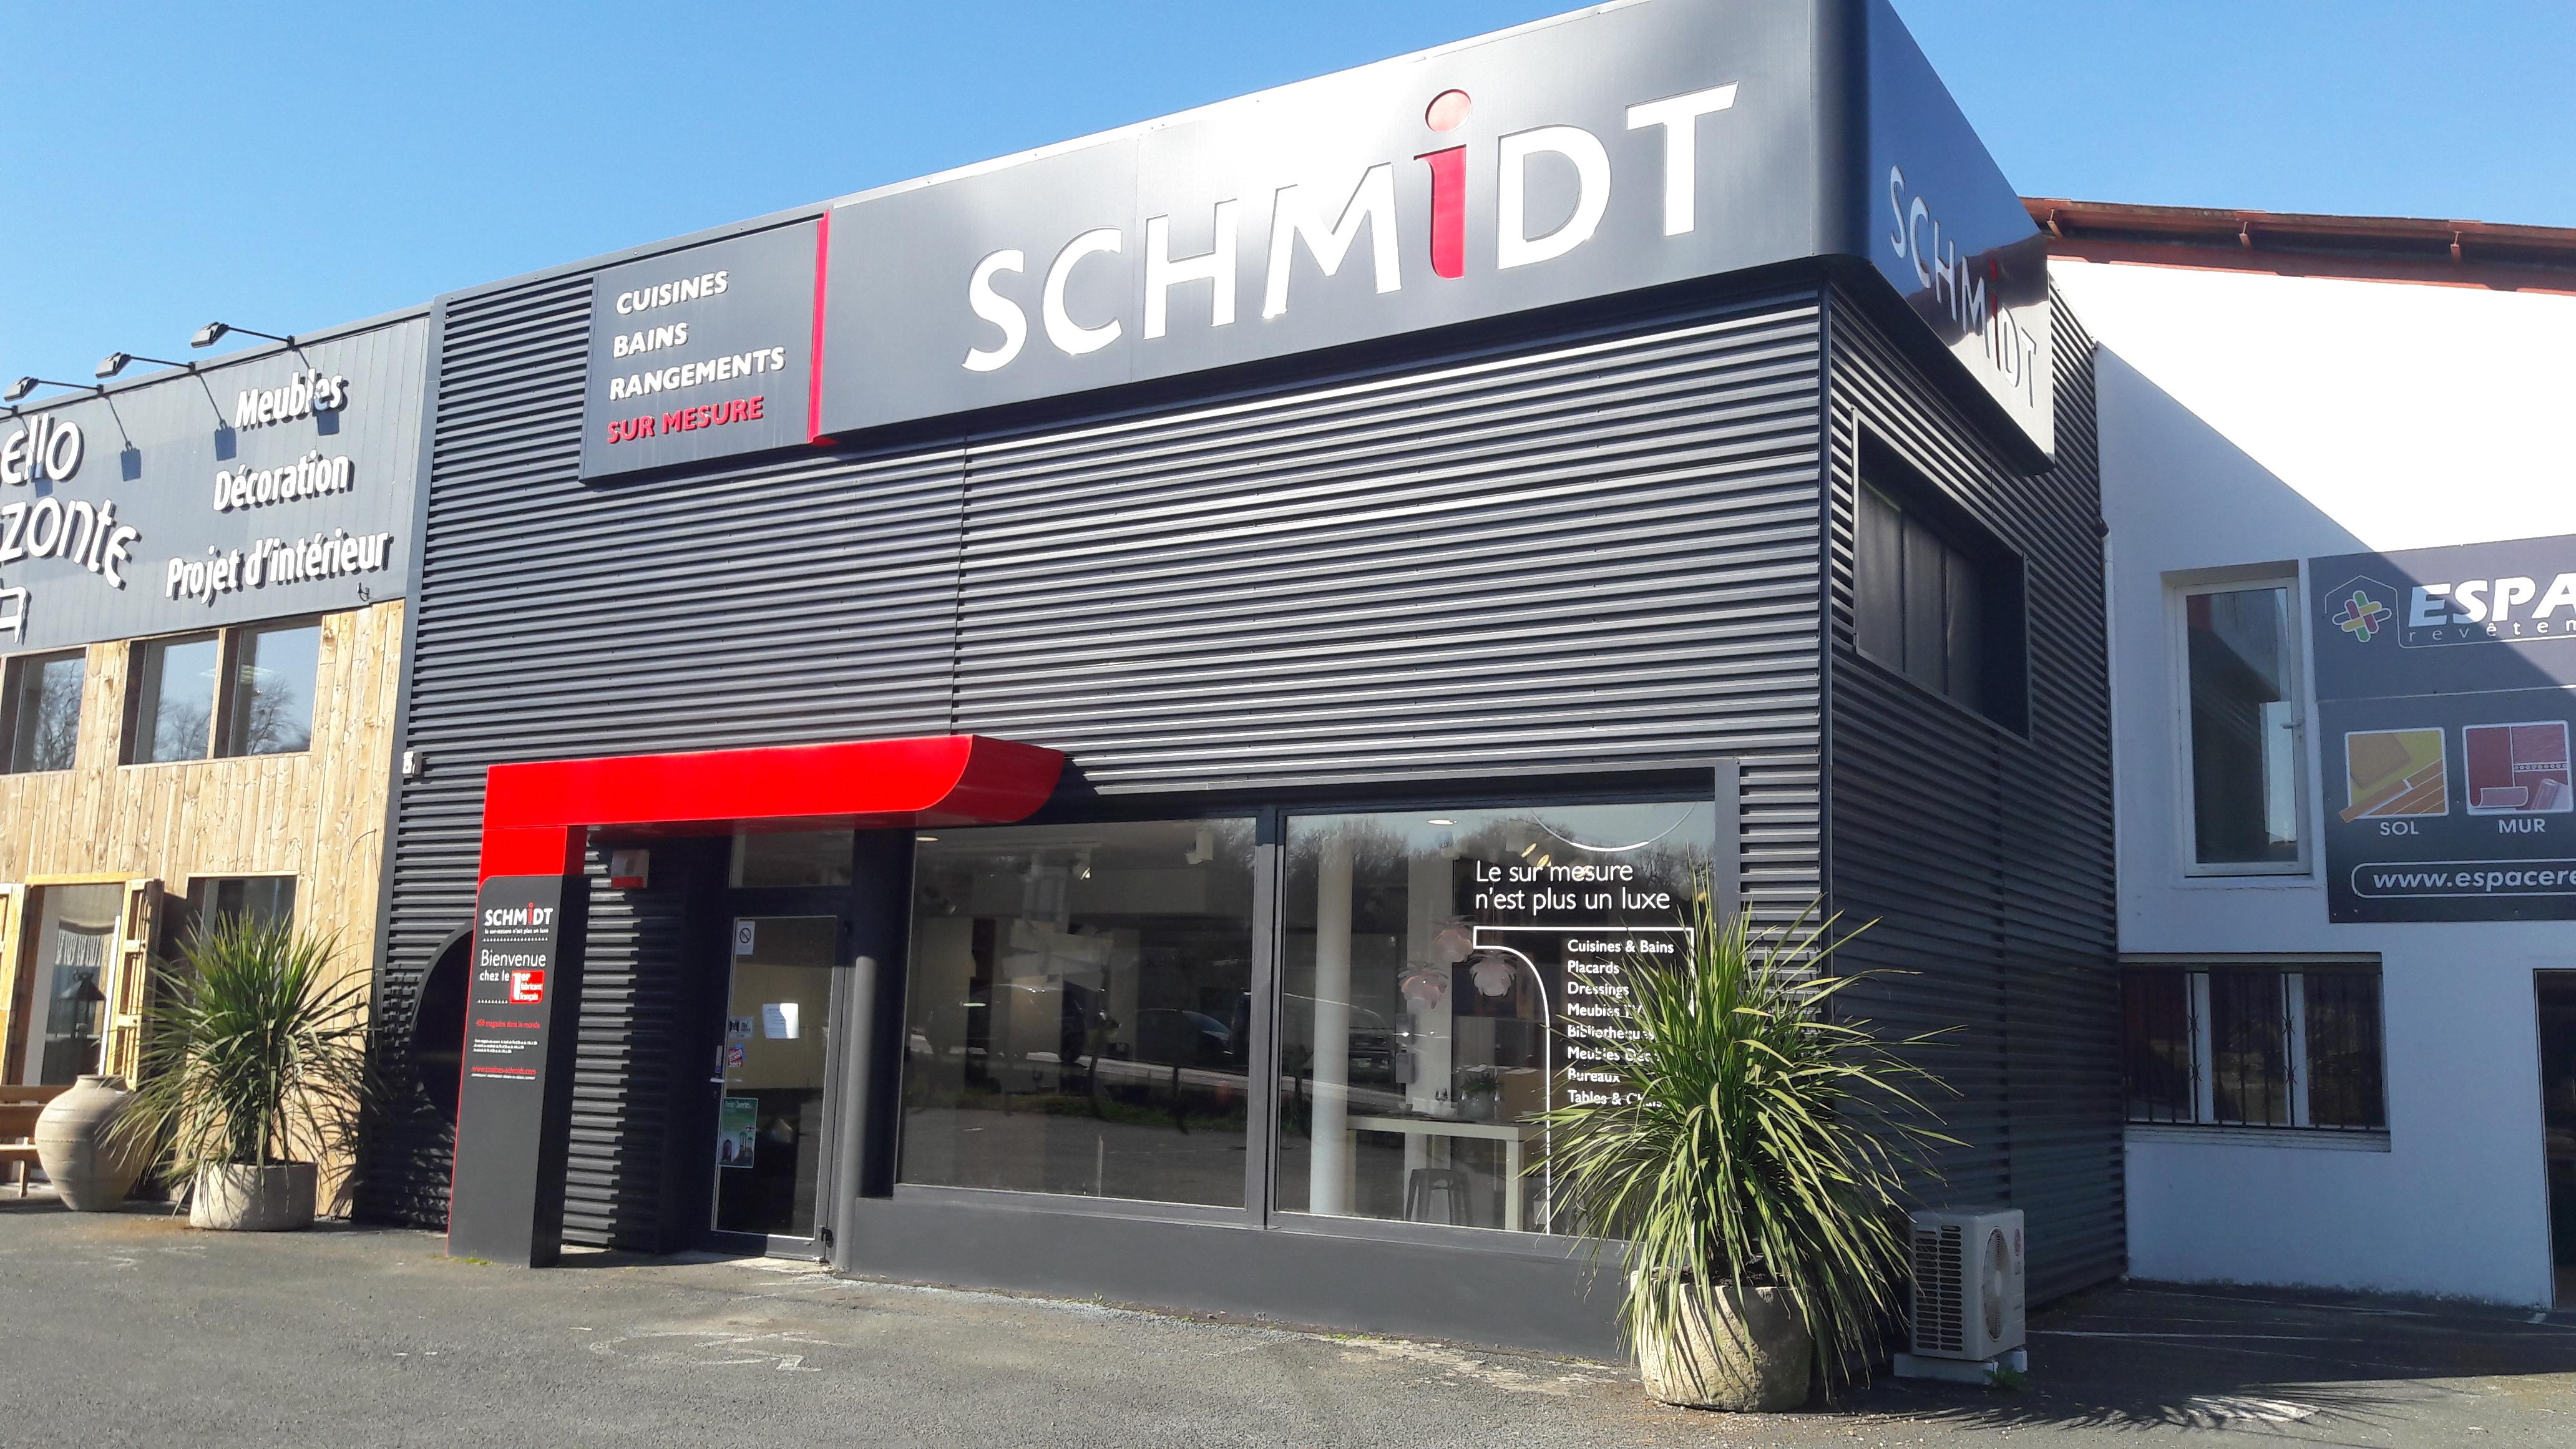 SCHMIDT SAINT-JEAN-DE-LUZ